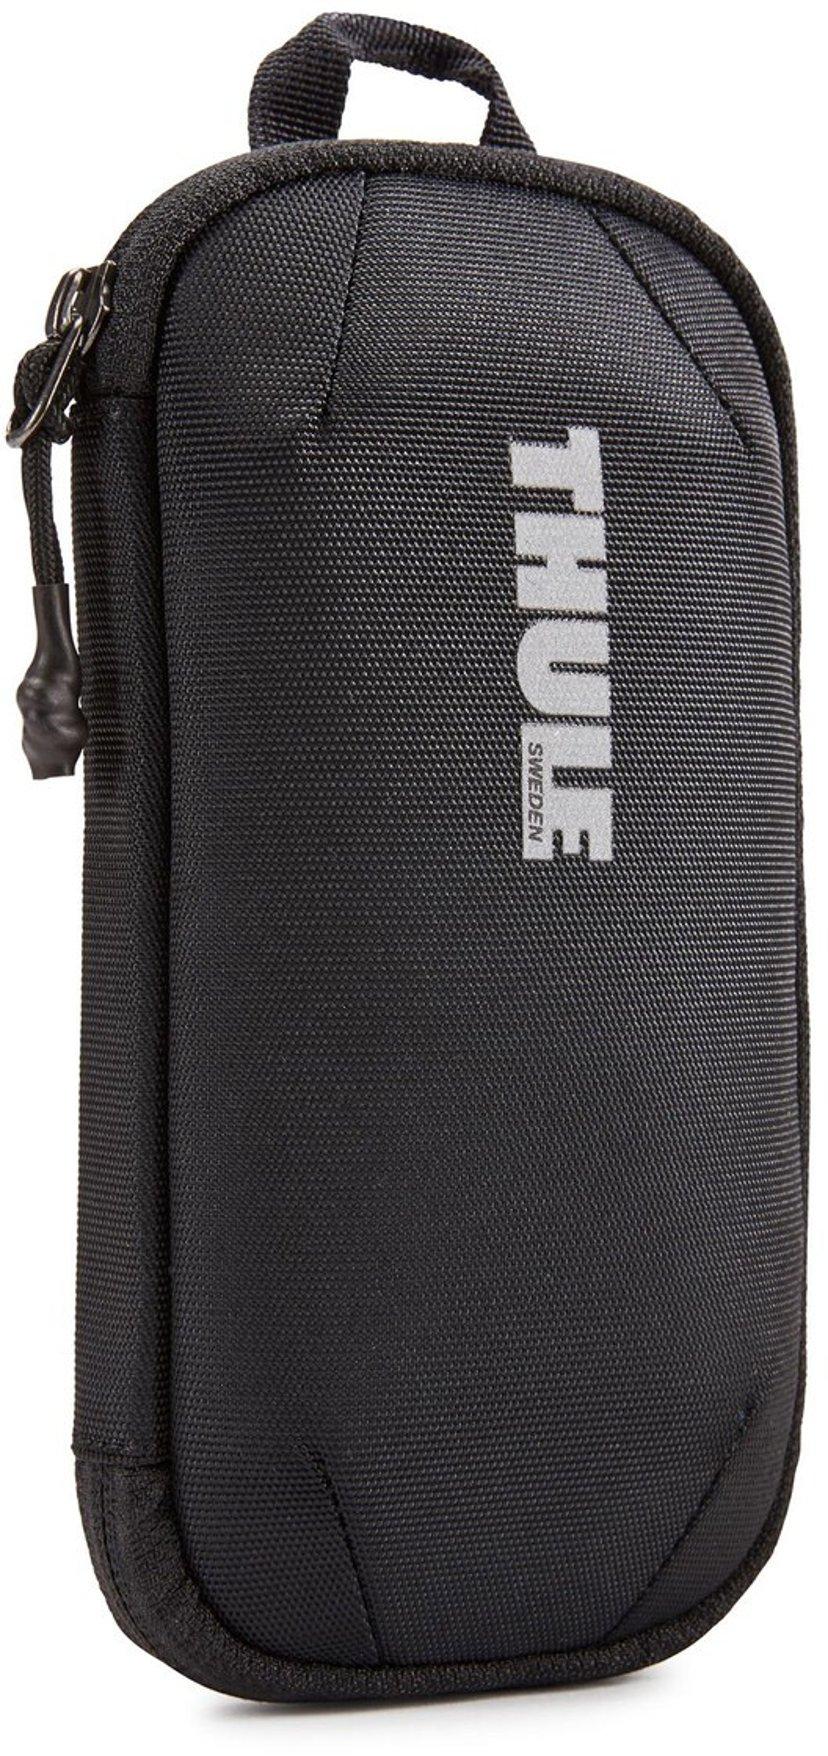 Thule Subterra PowerShuttle Mini Nylon